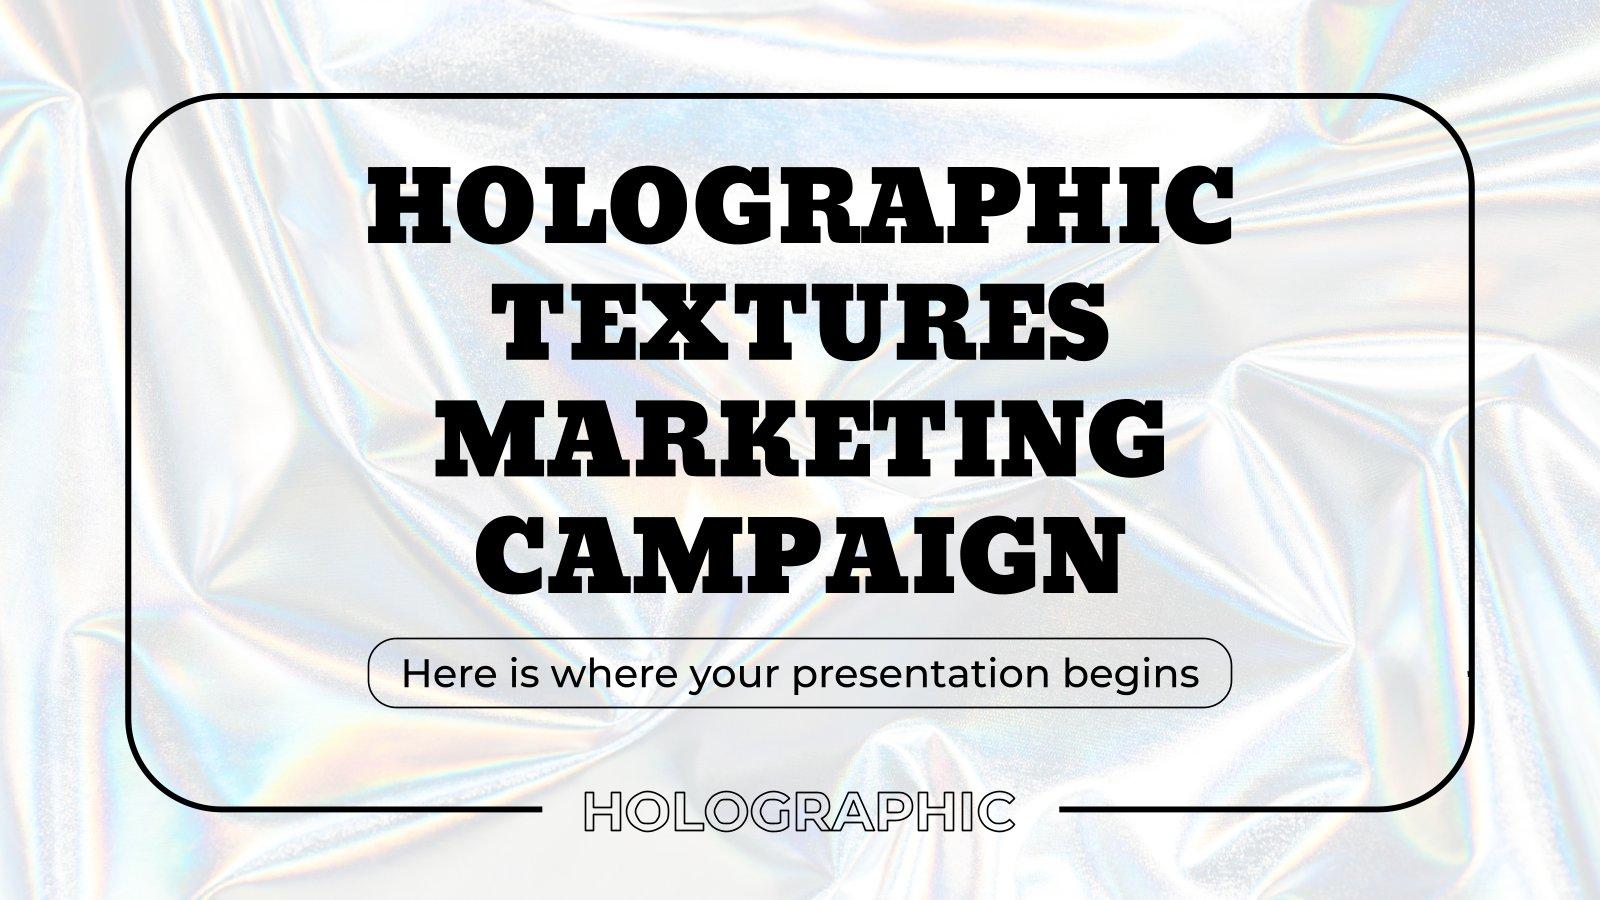 Plantilla de presentación Campaña de marketing con texturas